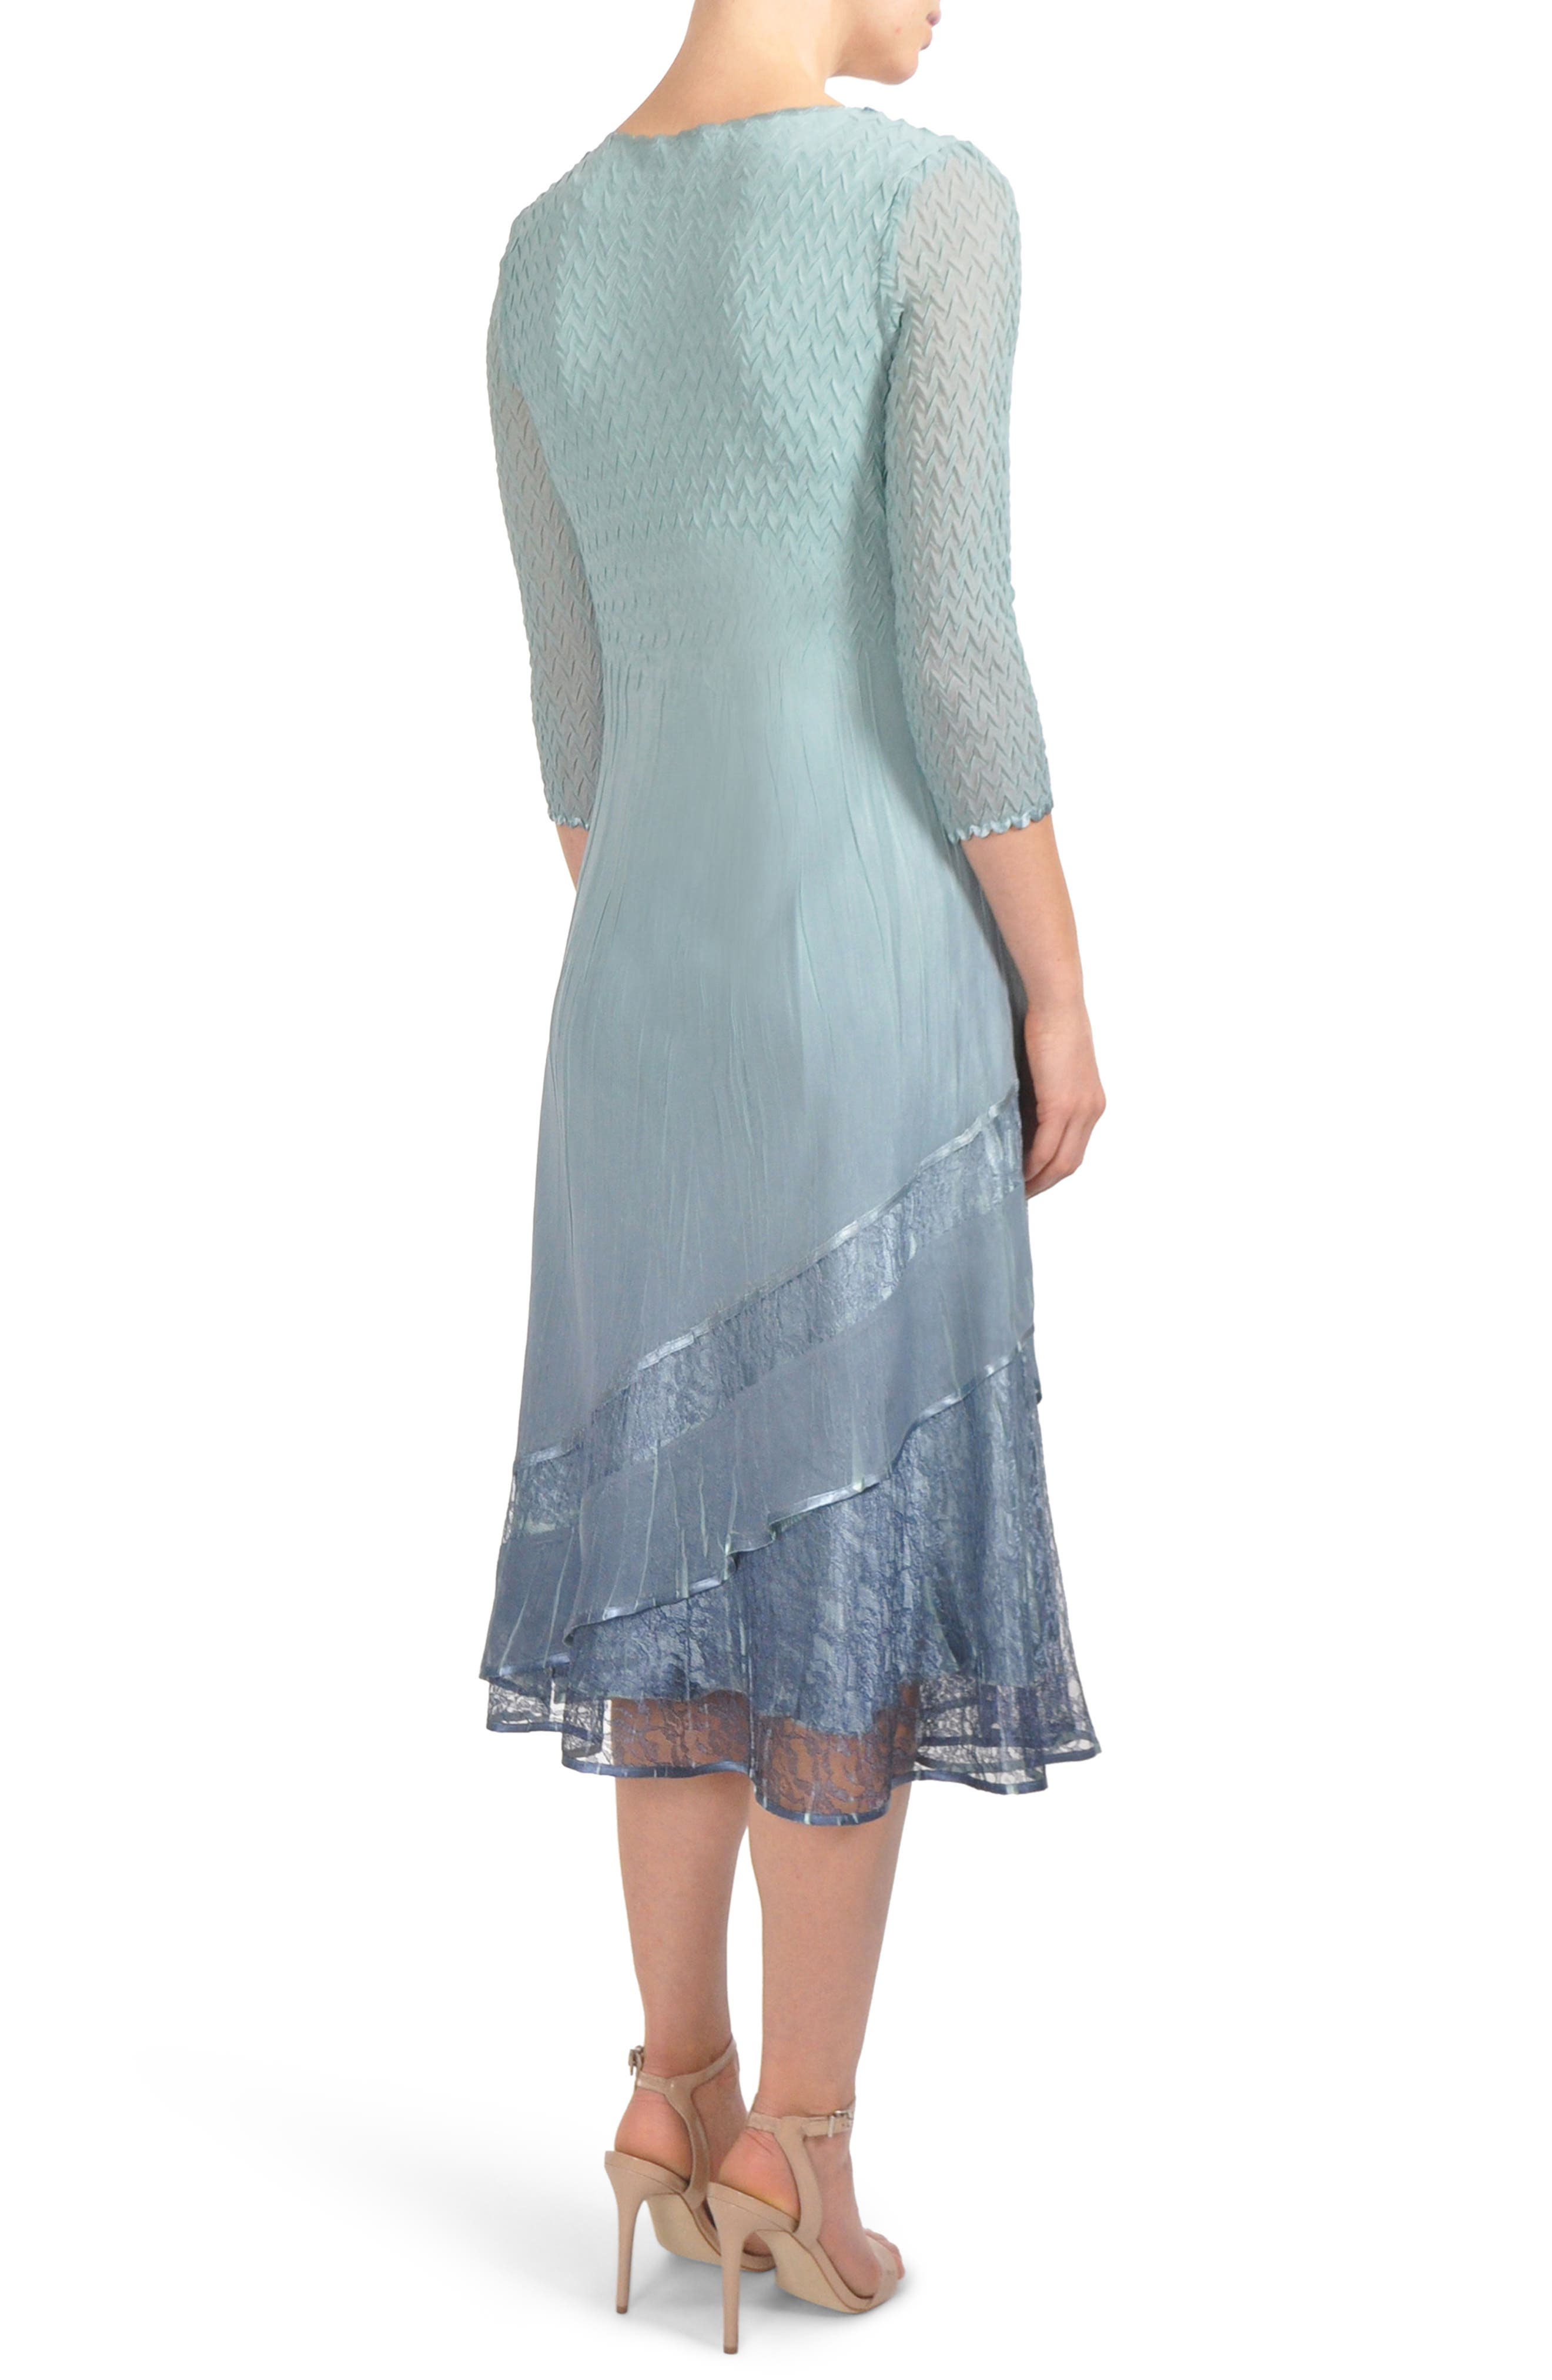 Beaded Neck Tier Hem Dress,                             Alternate thumbnail 2, color,                             Ocean Blue Night Ombre